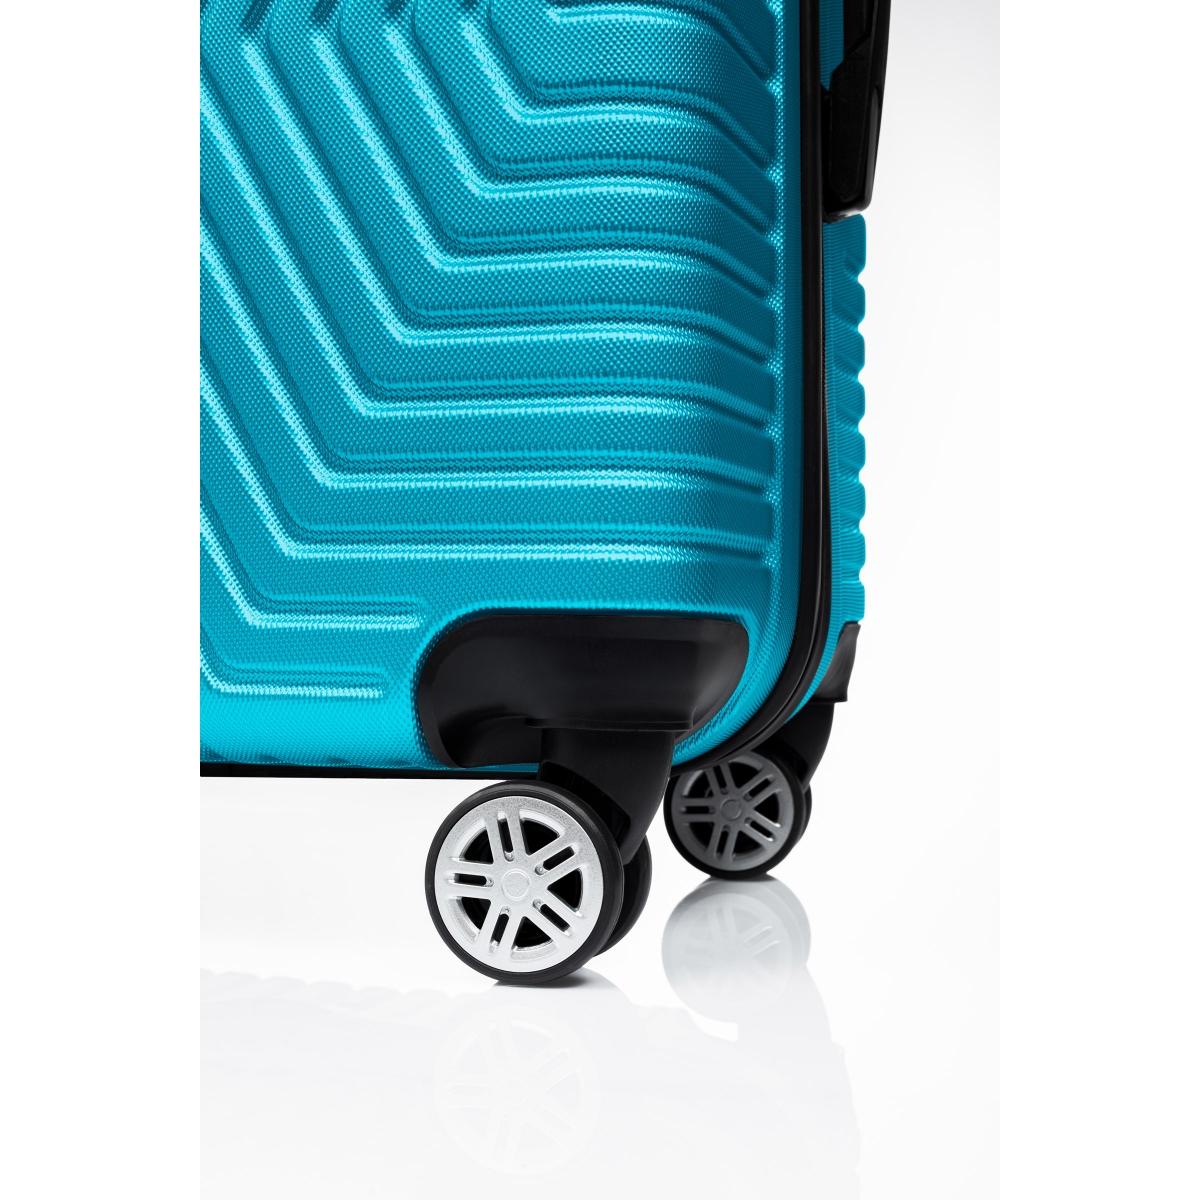 G&D Polo Suitcase ABS 3'lü Lüx Valiz Seyahat Seti - Model:600.16 Turkuaz